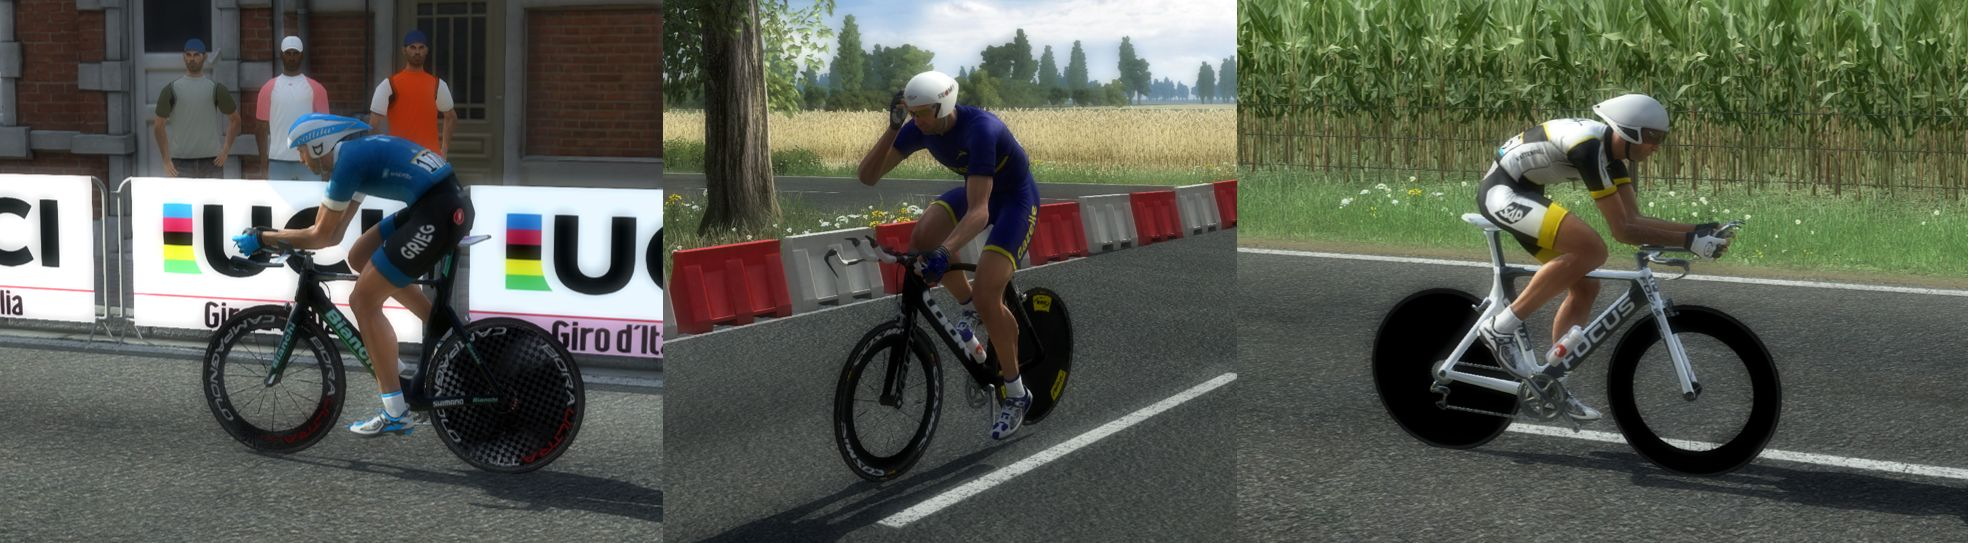 pcmdaily.com/images/mg/2020/Reports/GTM/Giro/S14/mg20_giro_s14_65.jpg